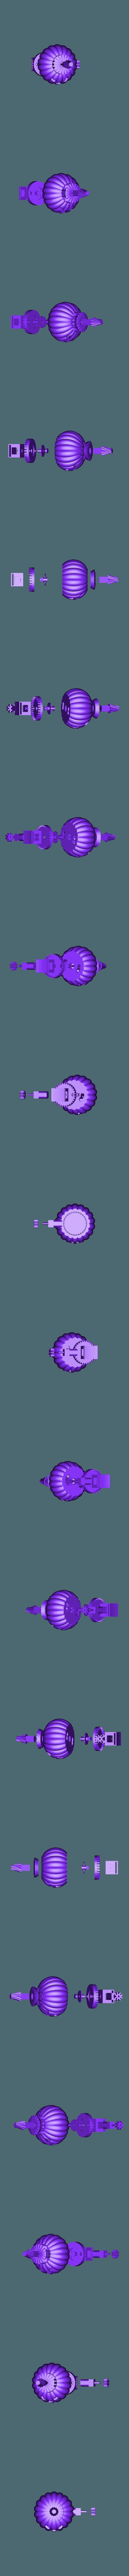 Assembly_Lighted.stl Download free STL file Lighted Motorized Halloween Pumpkin Bracelet • Object to 3D print, gzumwalt